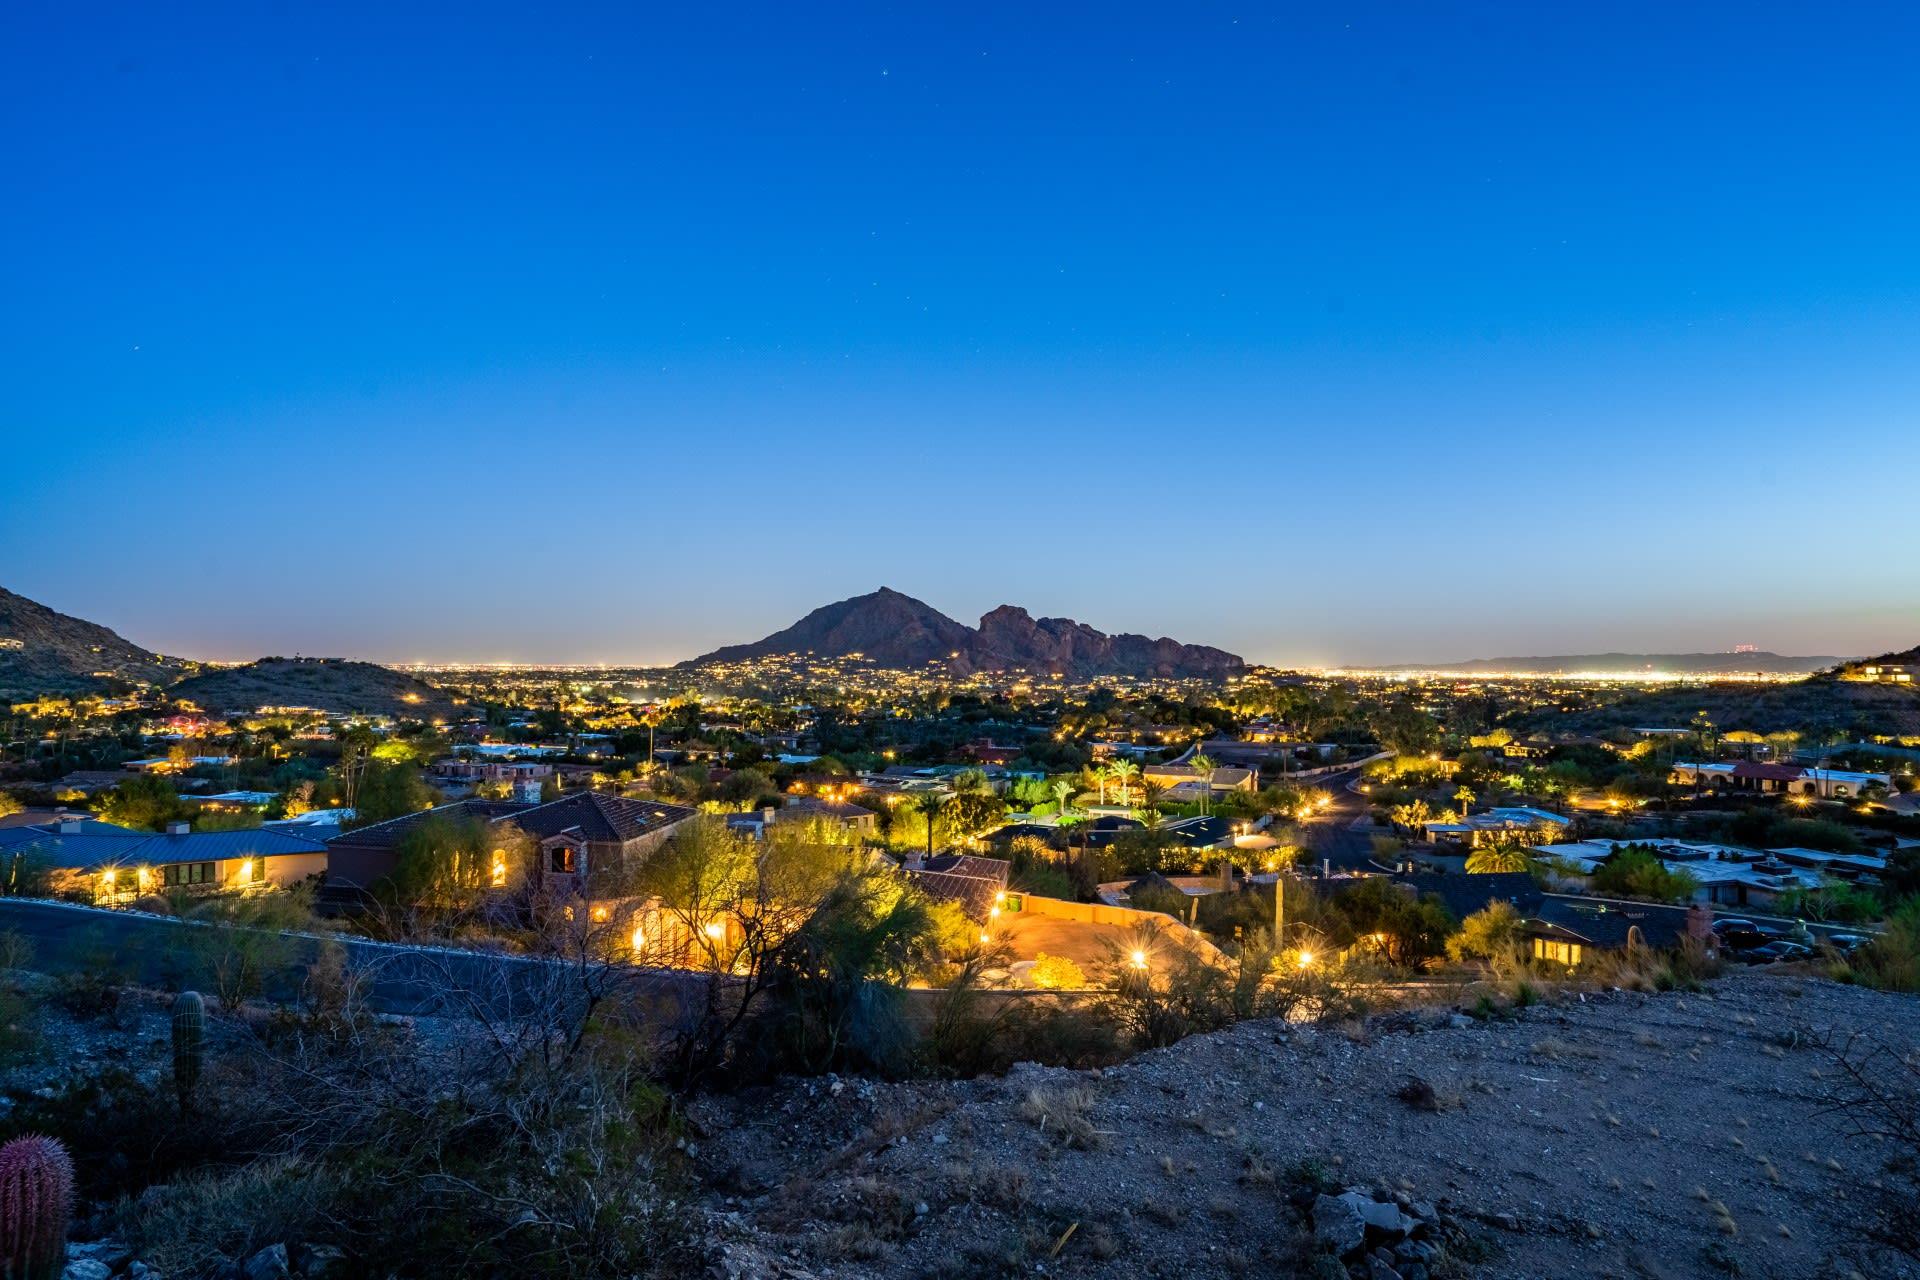 4540 E Moonlight Way, Paradise Valley, AZ